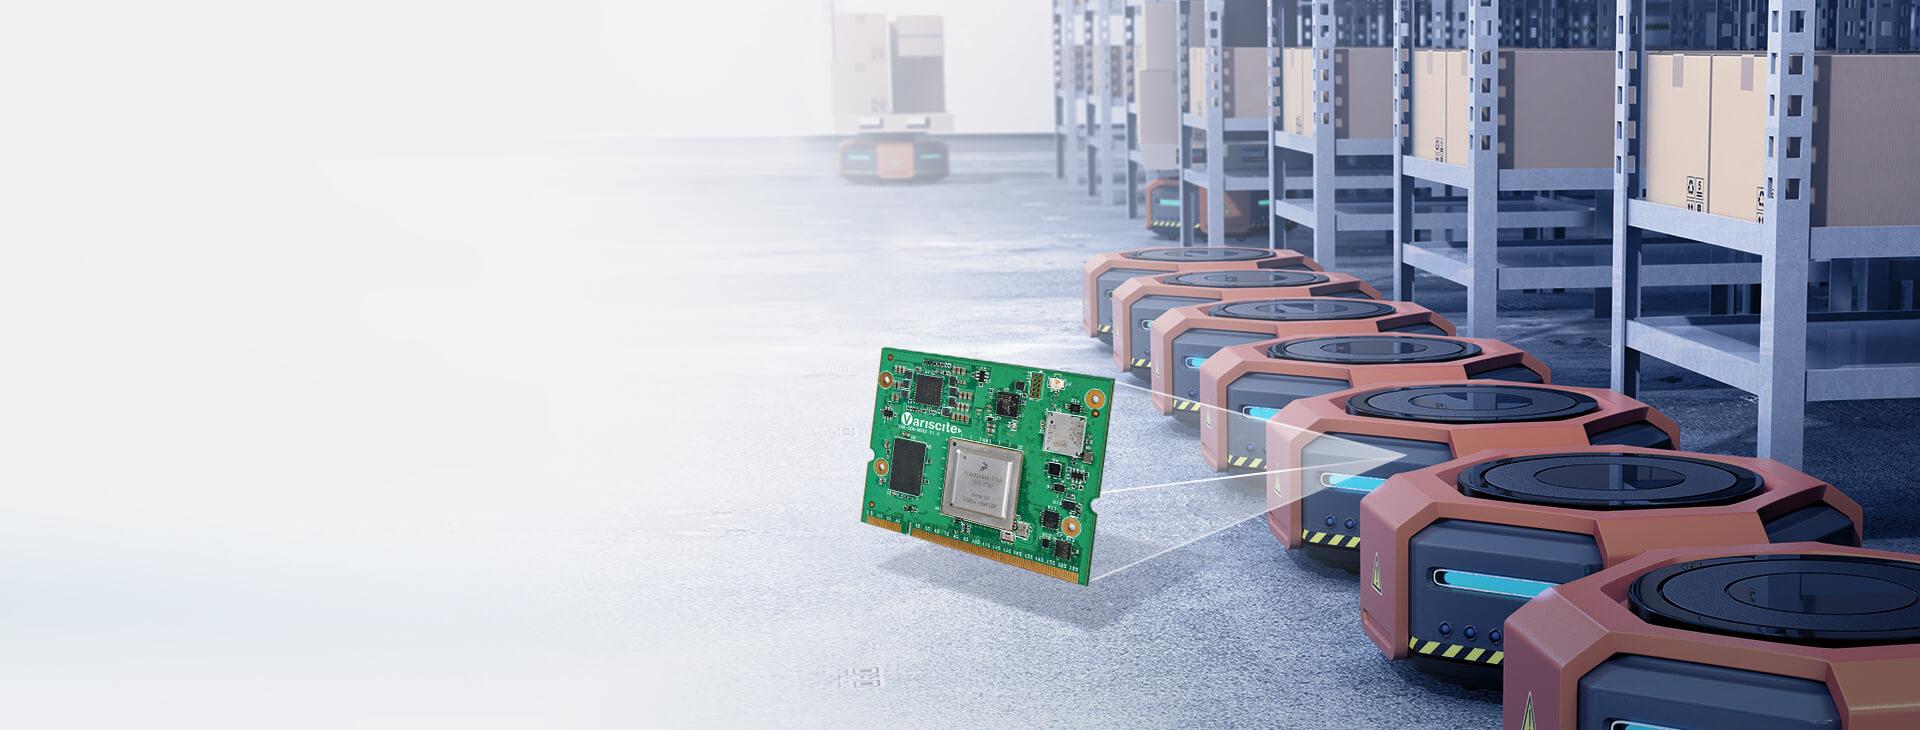 VAR-SOM-MX8X System on Module robots